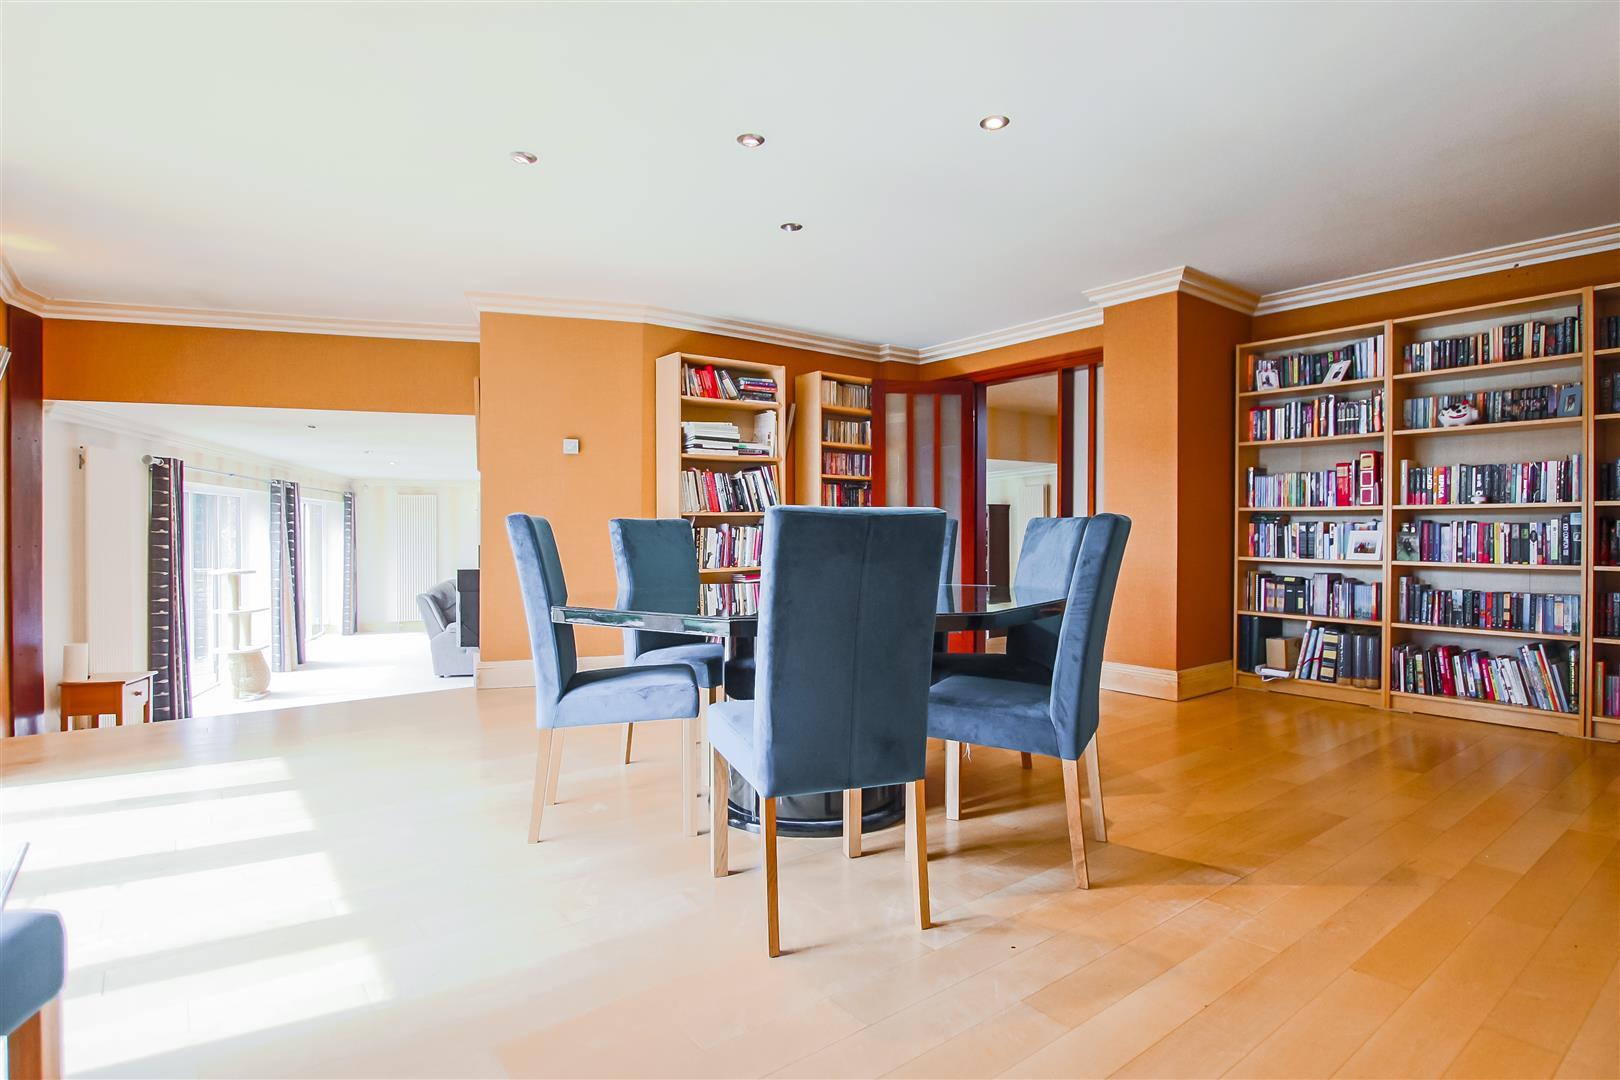 6 Bedroom Detached House For Sale - Dining room